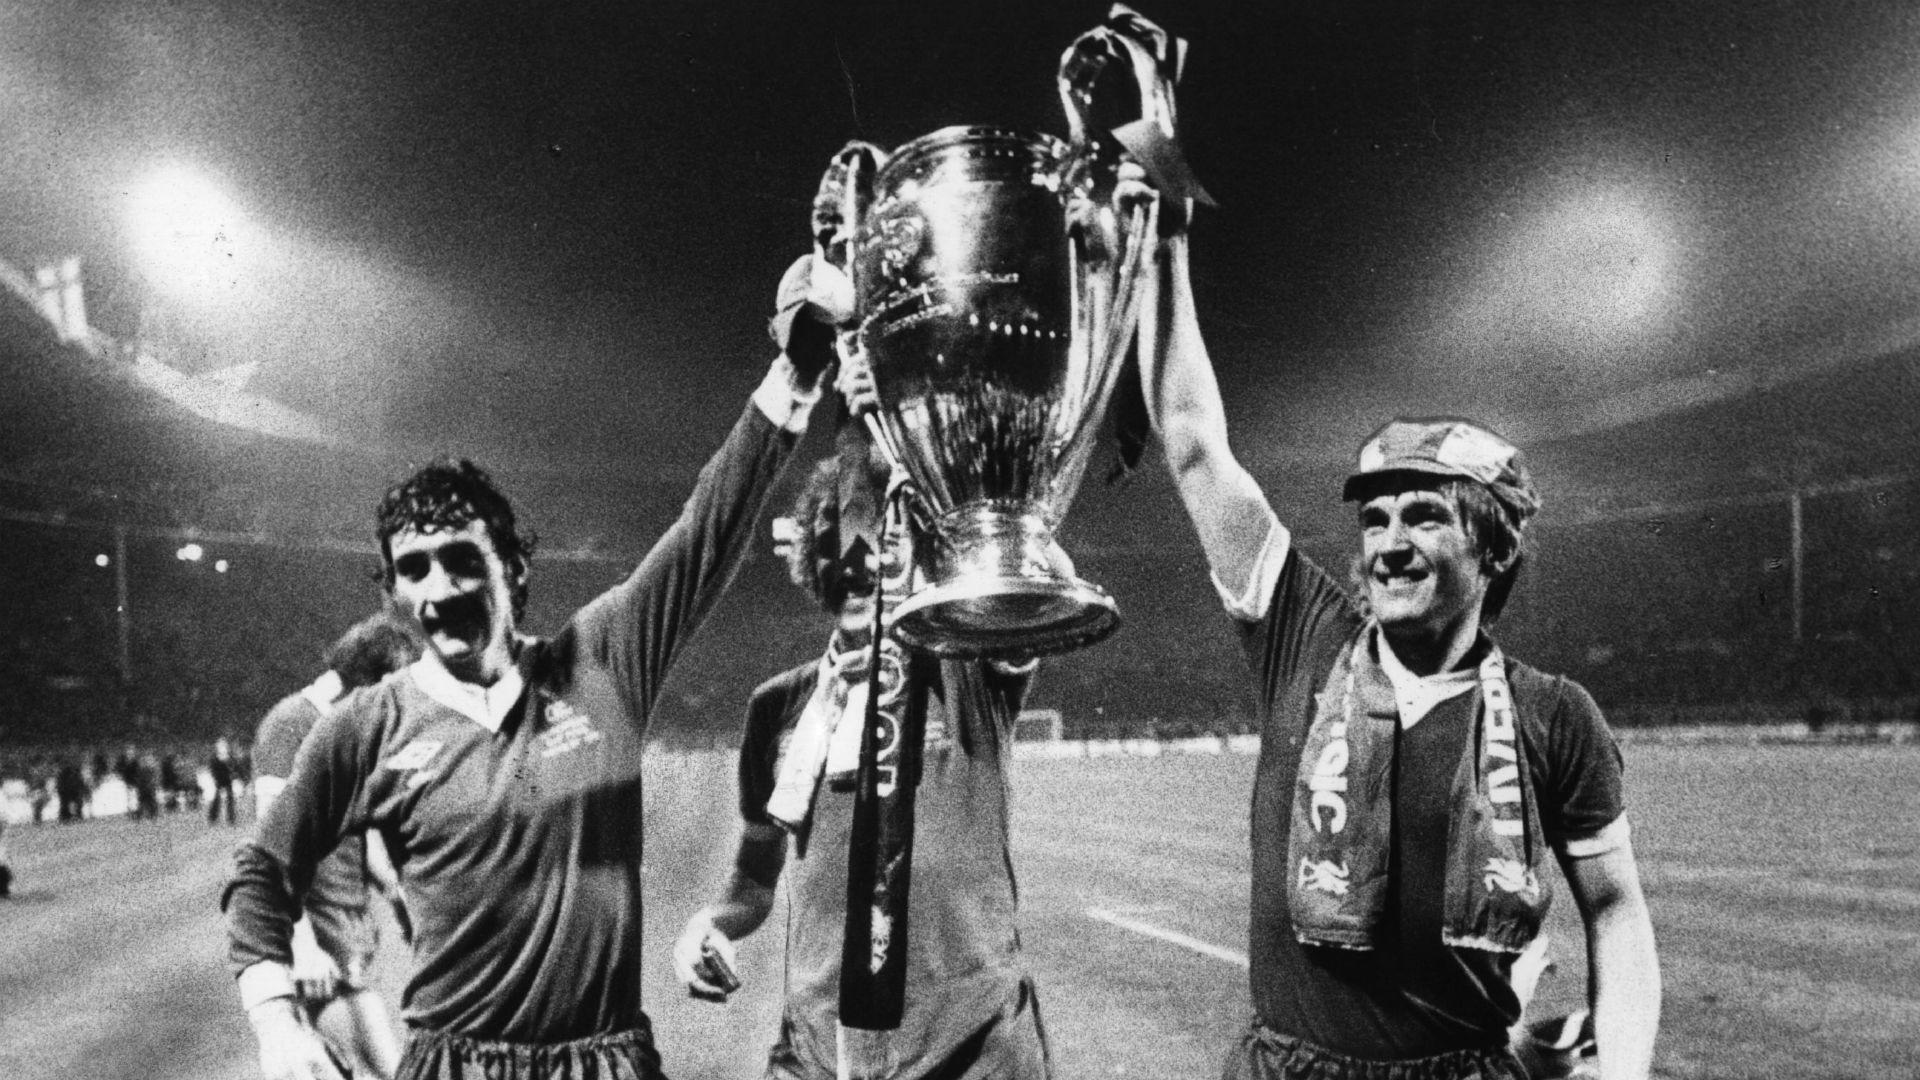 Terry McDermott Kenny Dalglish Liverpool European Cup 1978